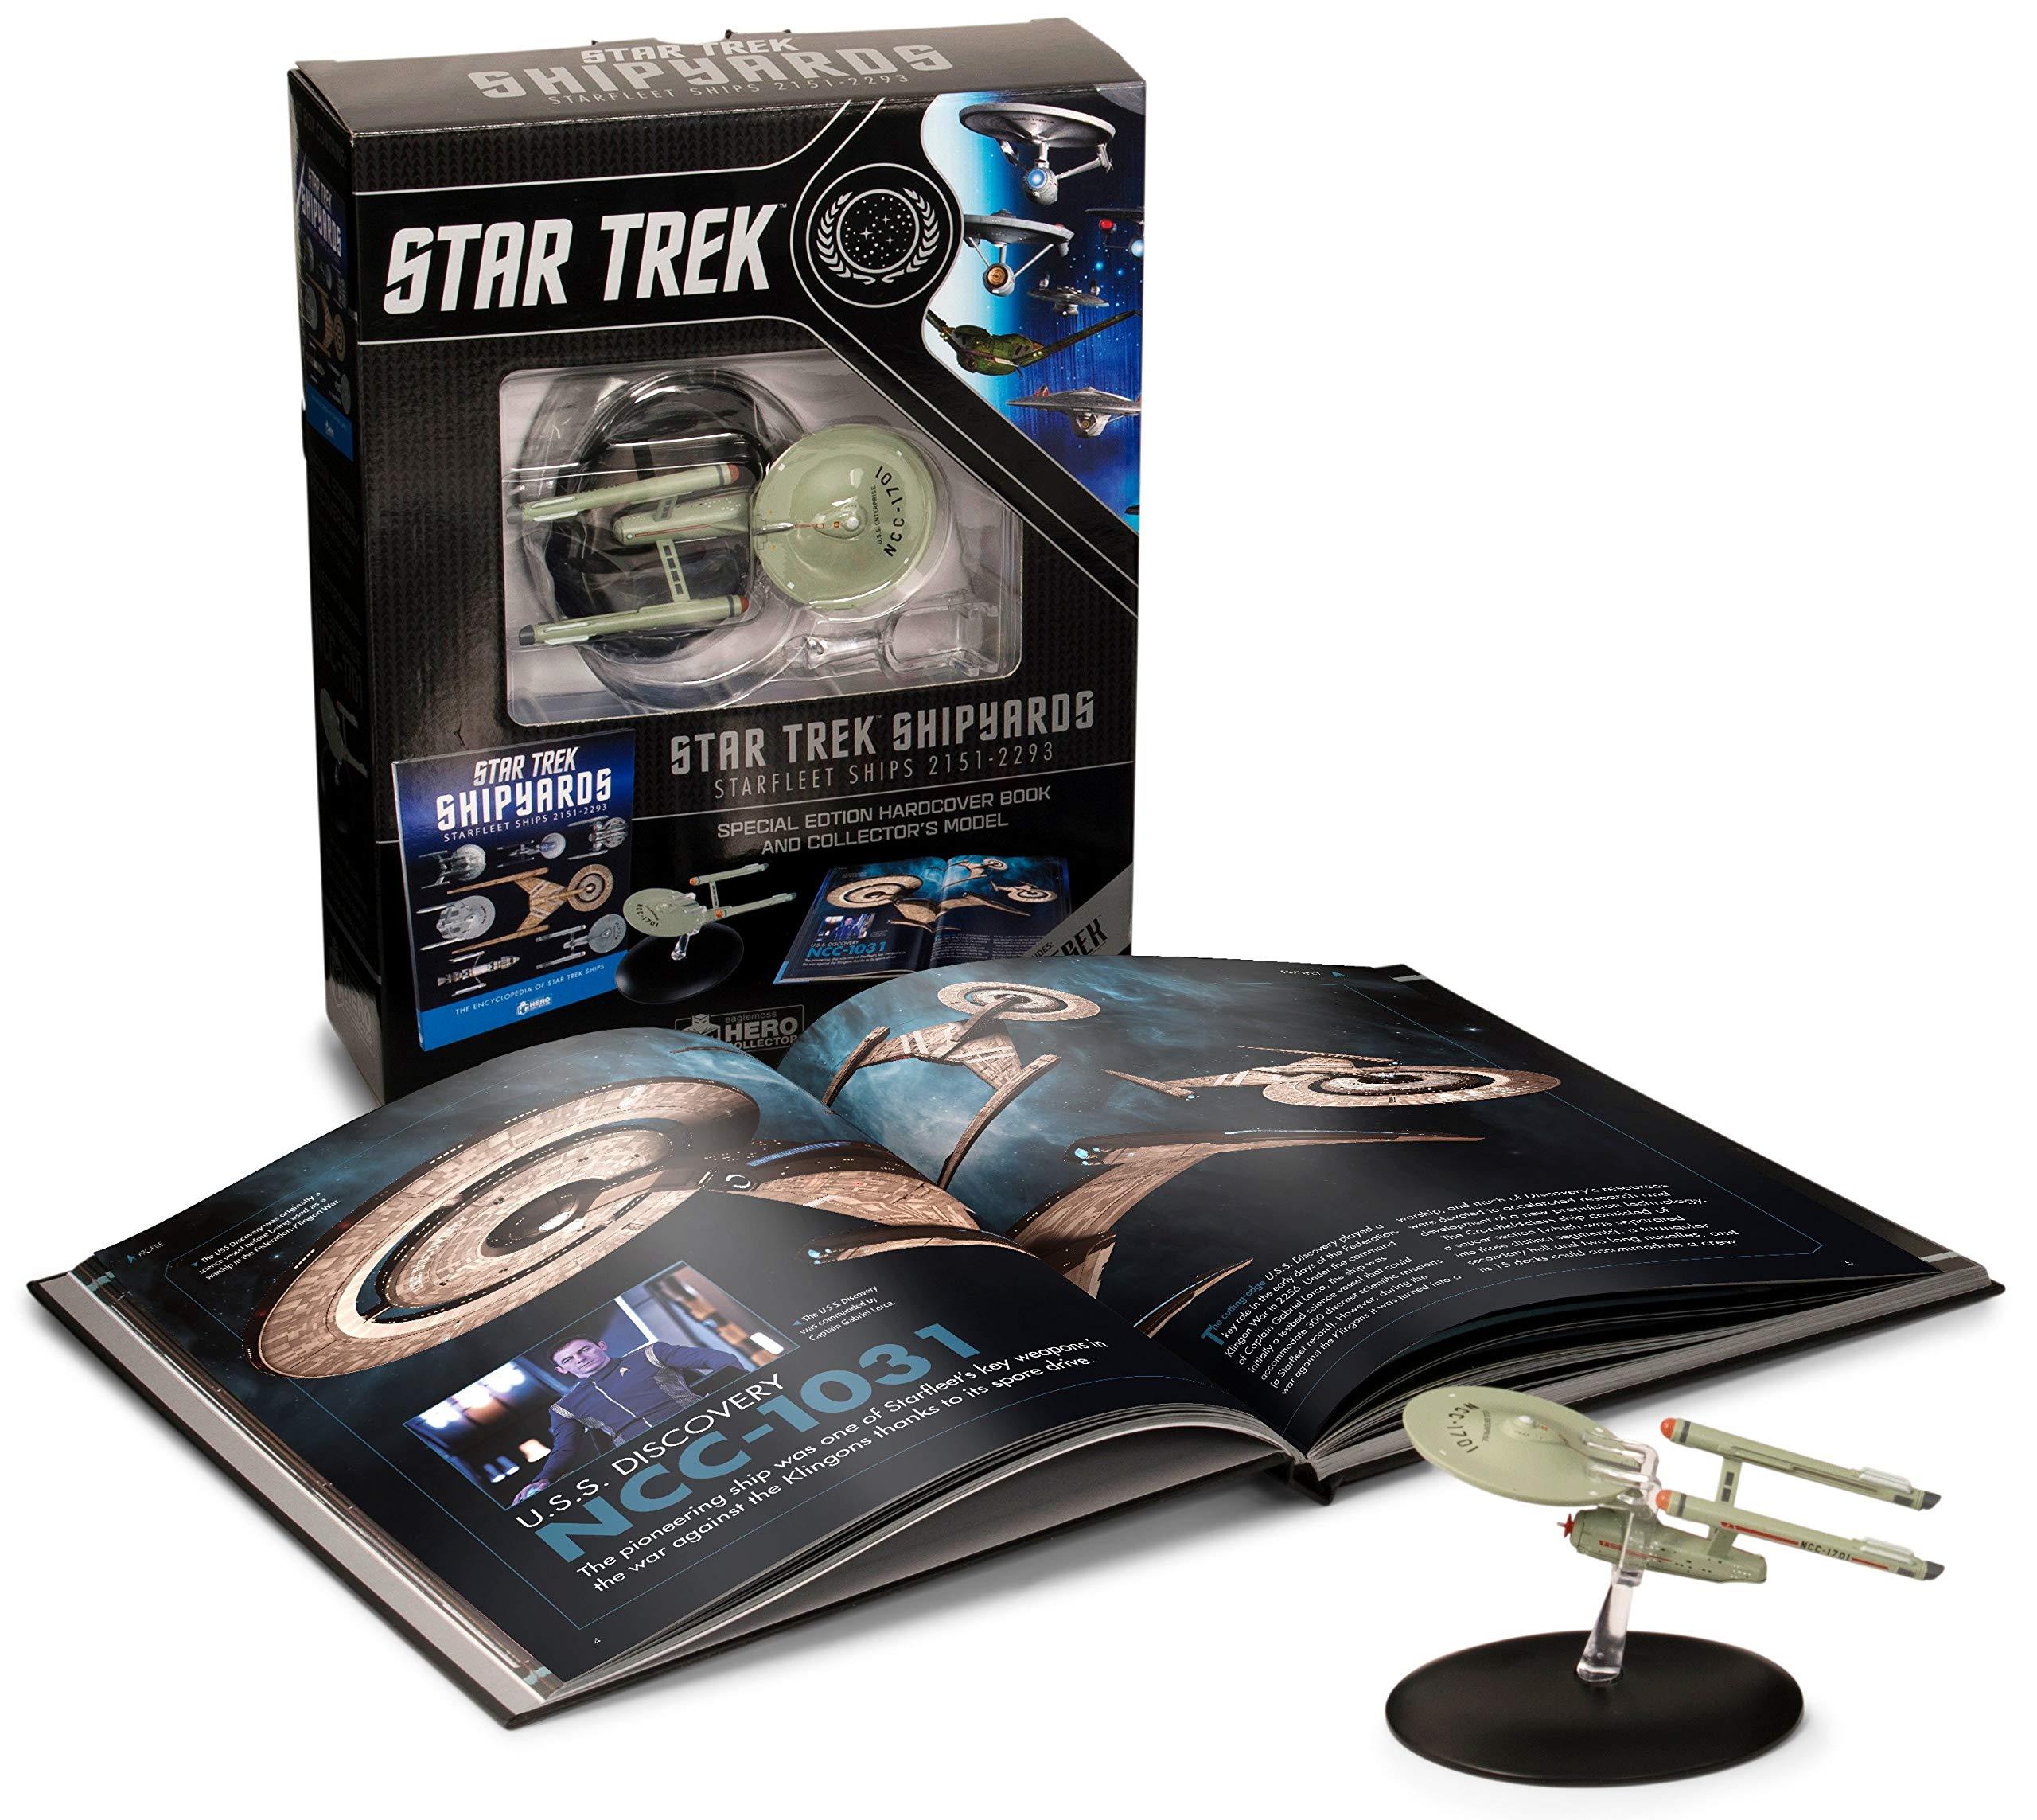 Star Trek Shipyards Star Trek Starships 2151-2293 The Encyclopedia Of Starfleet Ships Plus Collectible